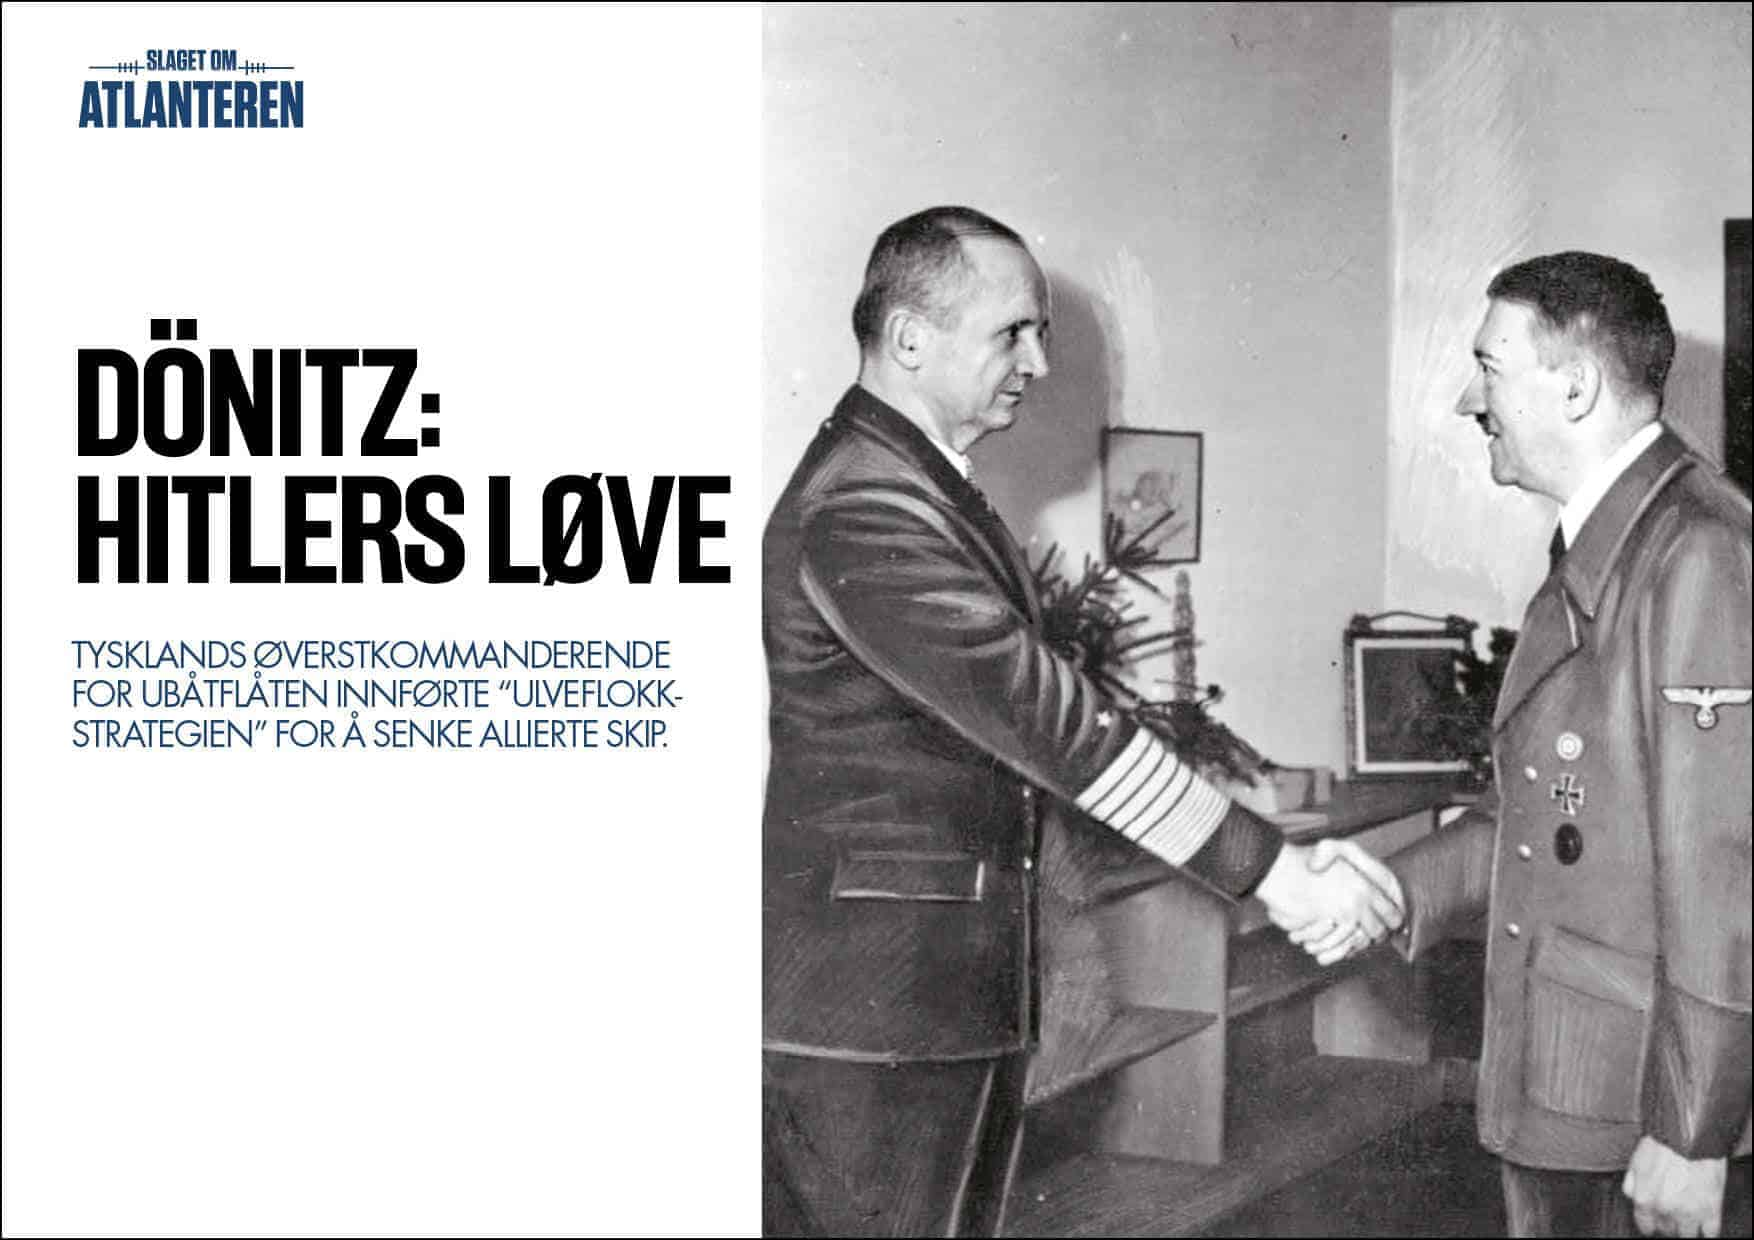 Dönitz: Hitlers løve